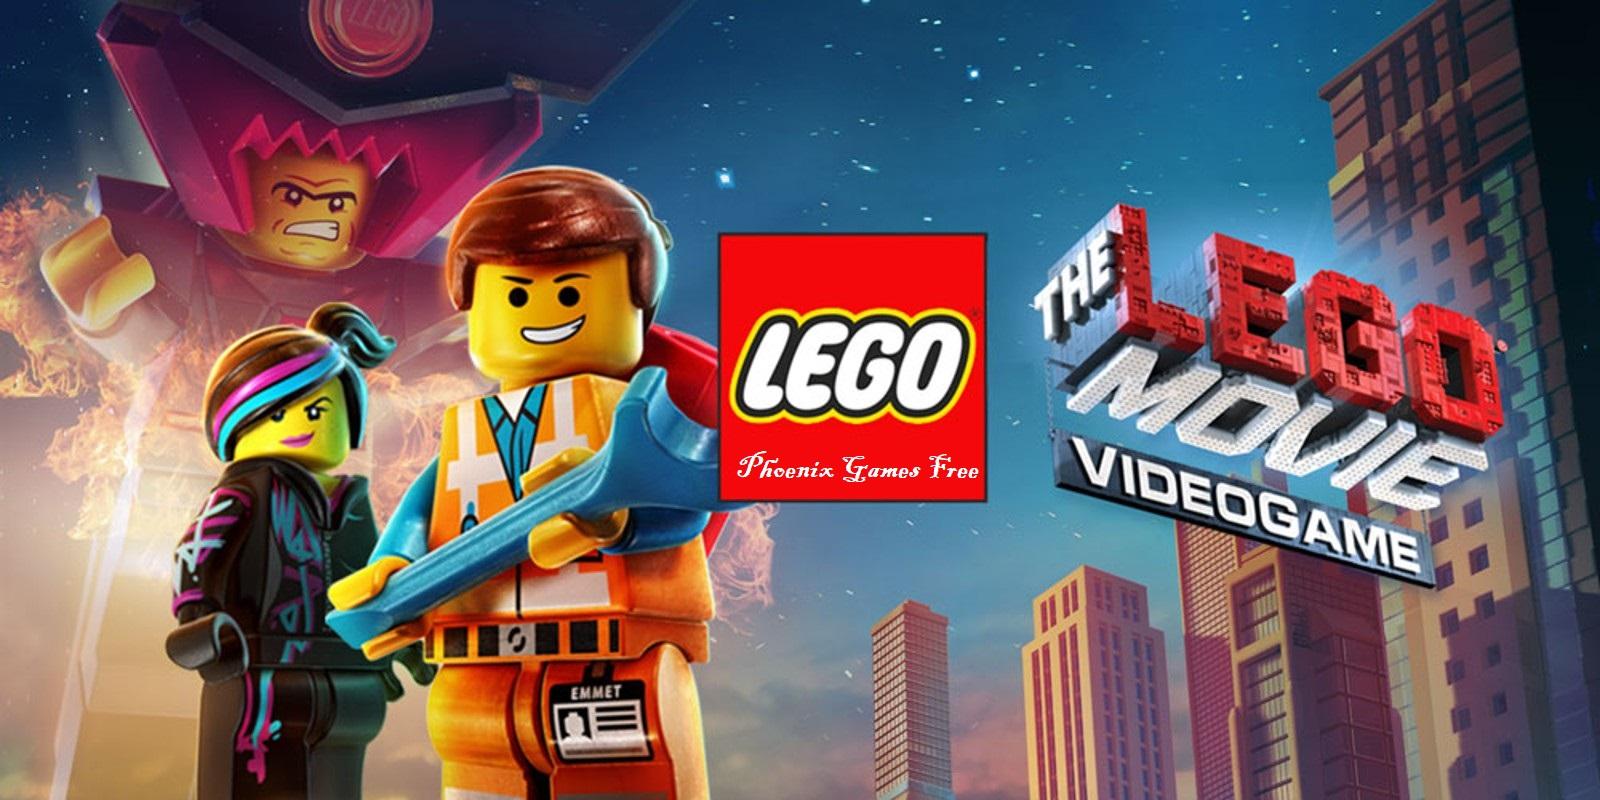 Phoenix Games Free Descargar The Lego Movie Videogame Ps3 Google Drive Direct